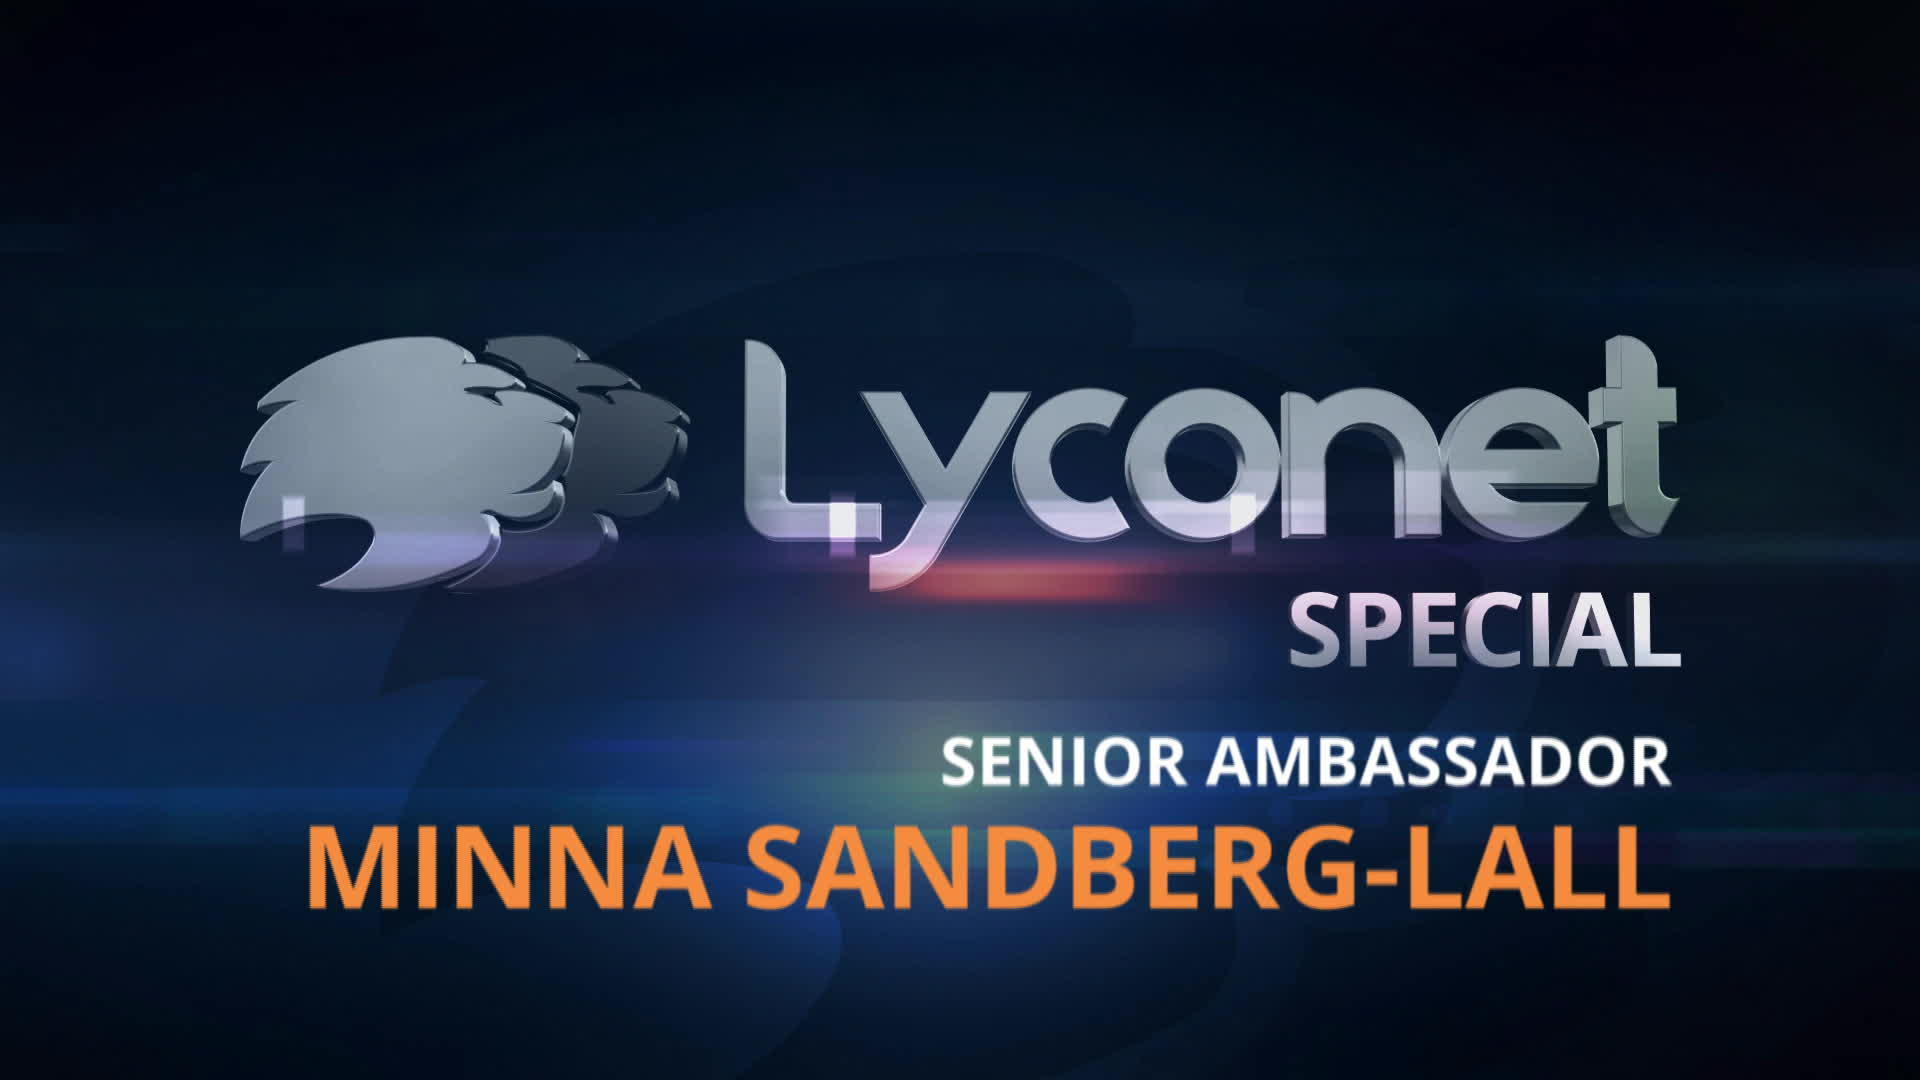 Senior Ambassador - Minna Sandberg-Lall